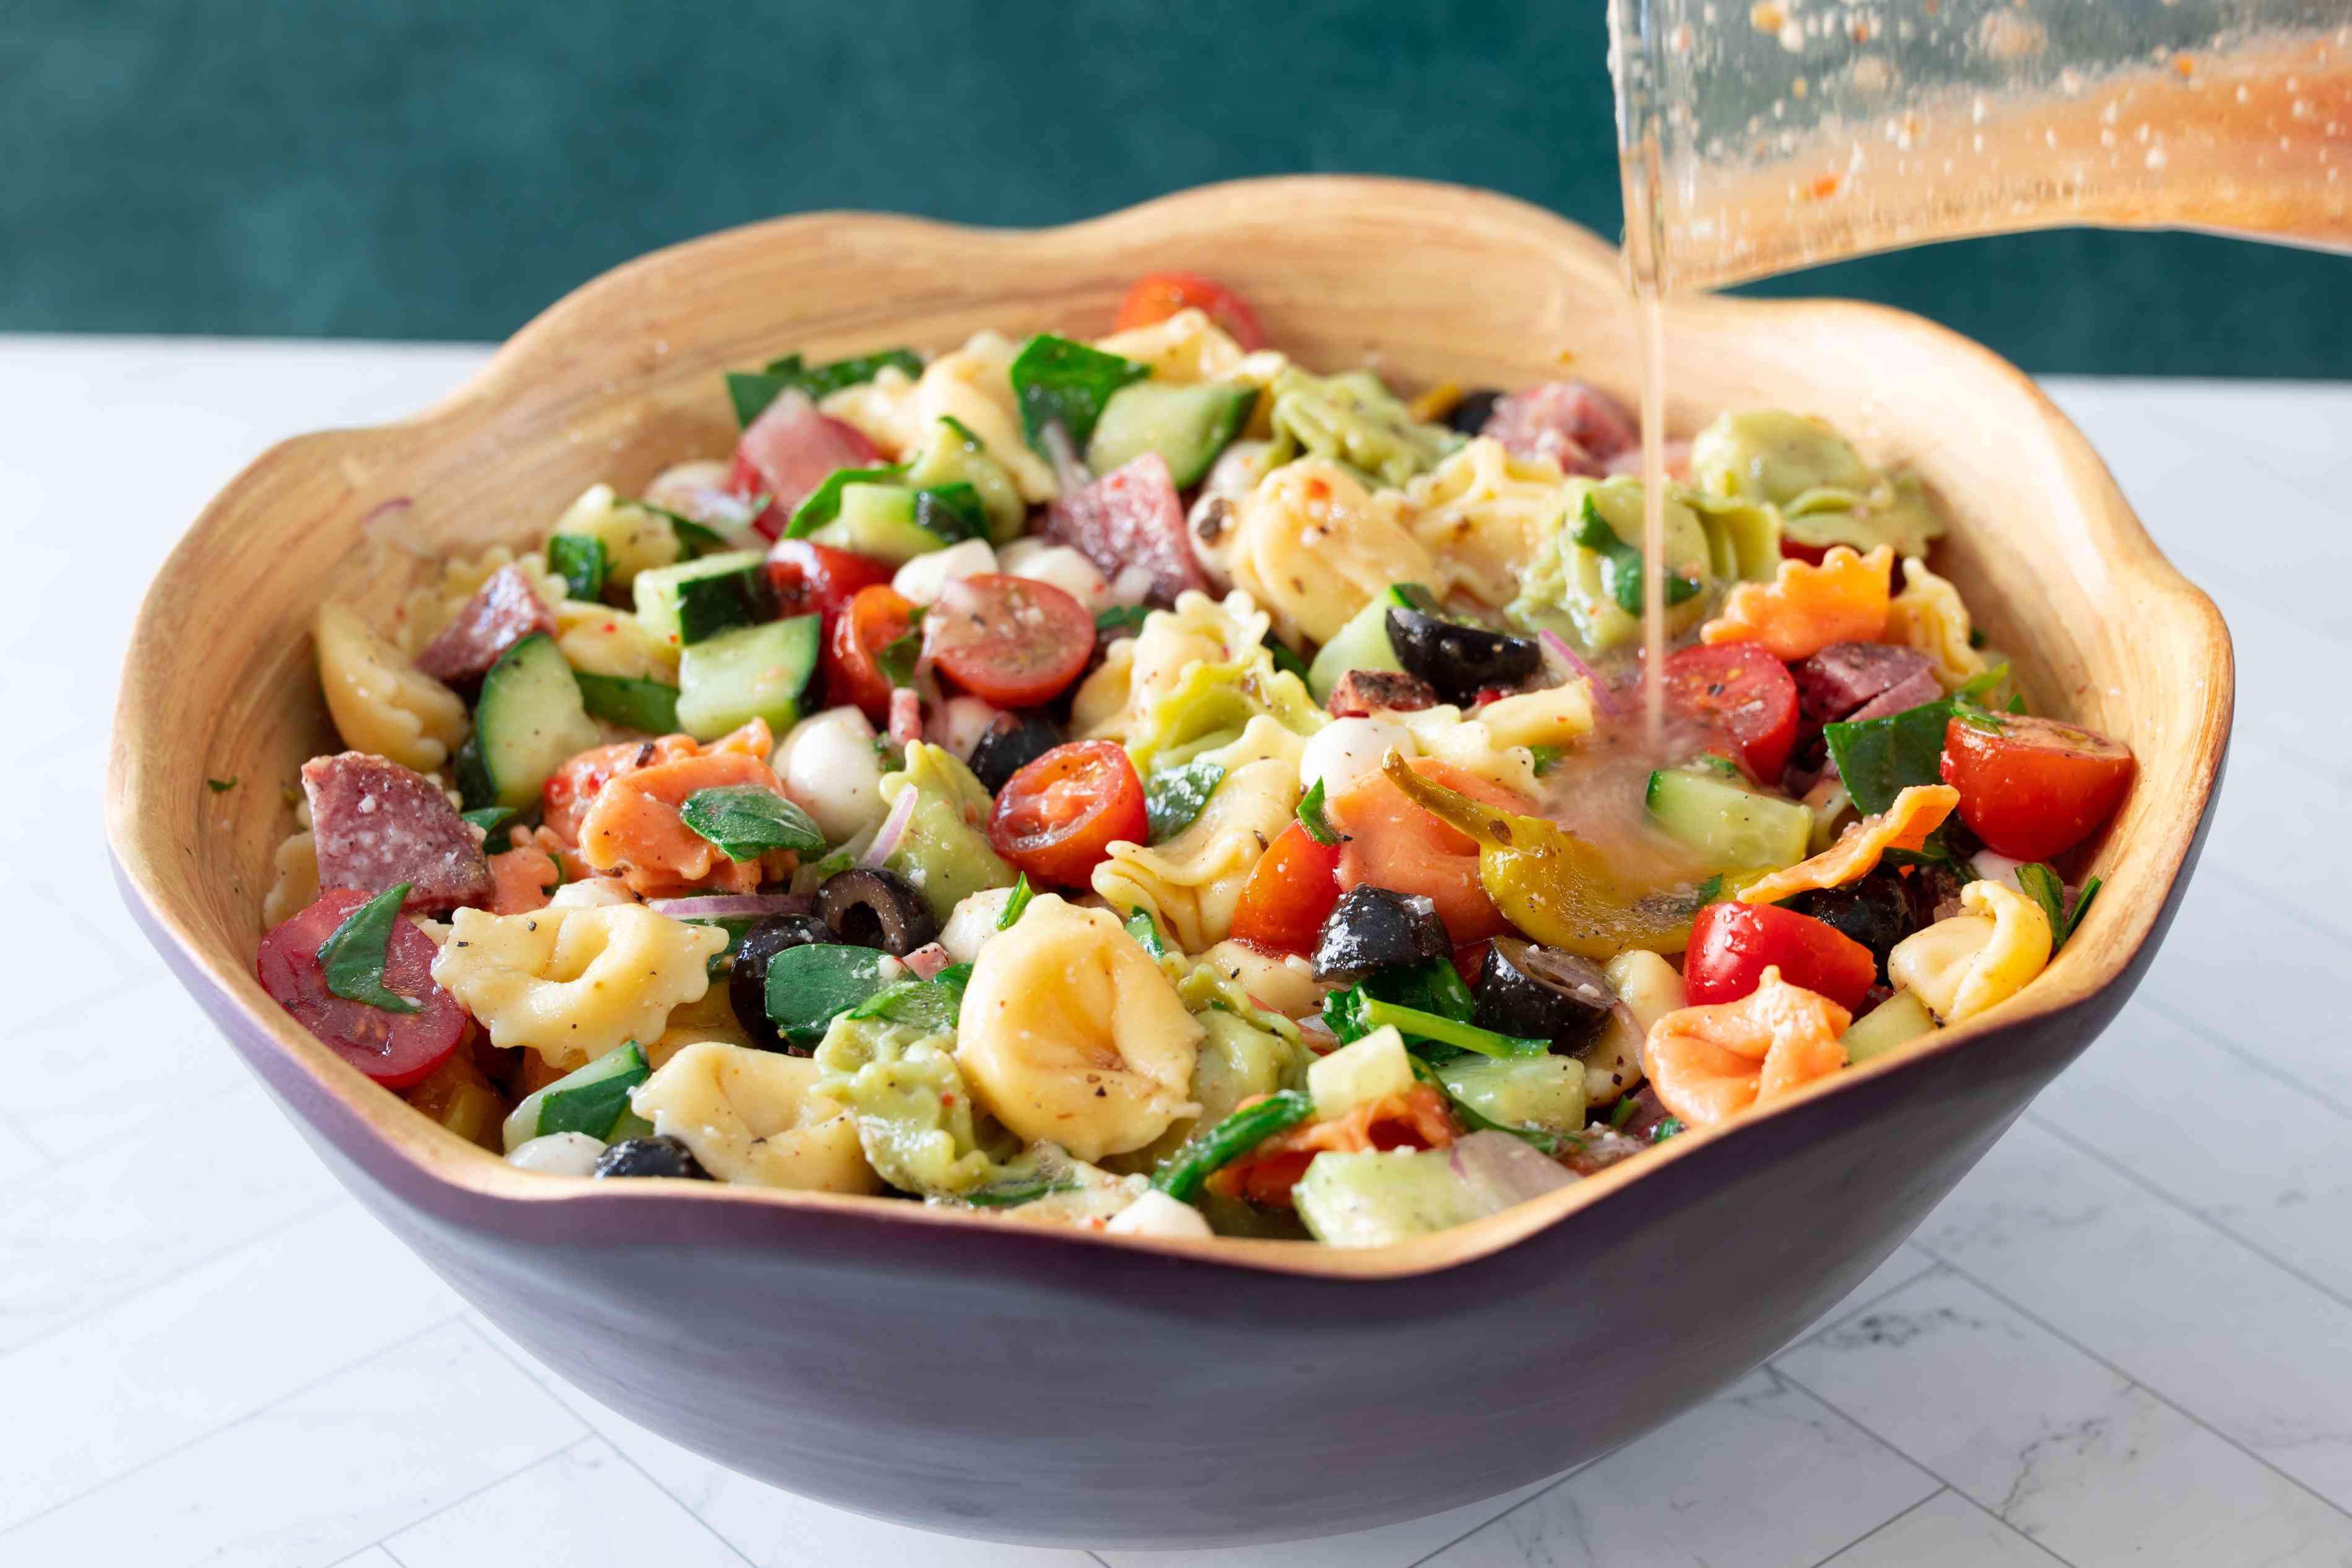 tortellini pasta salad and semi homemade dressing